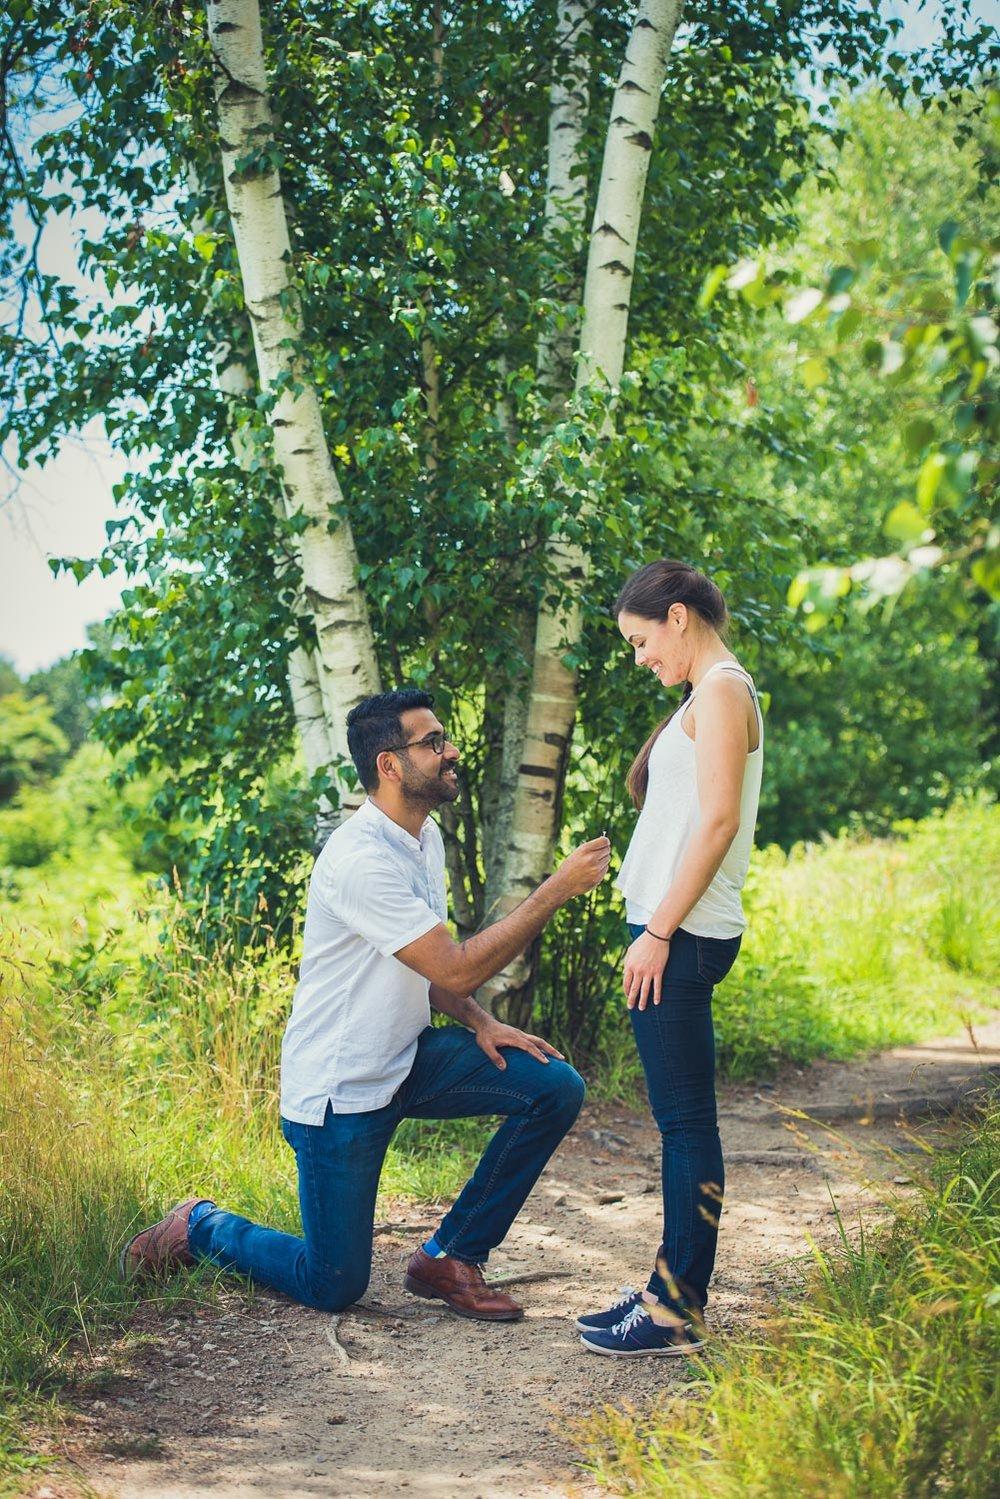 20170708 - Tiffany Pranshu Engagement LR-21.jpg